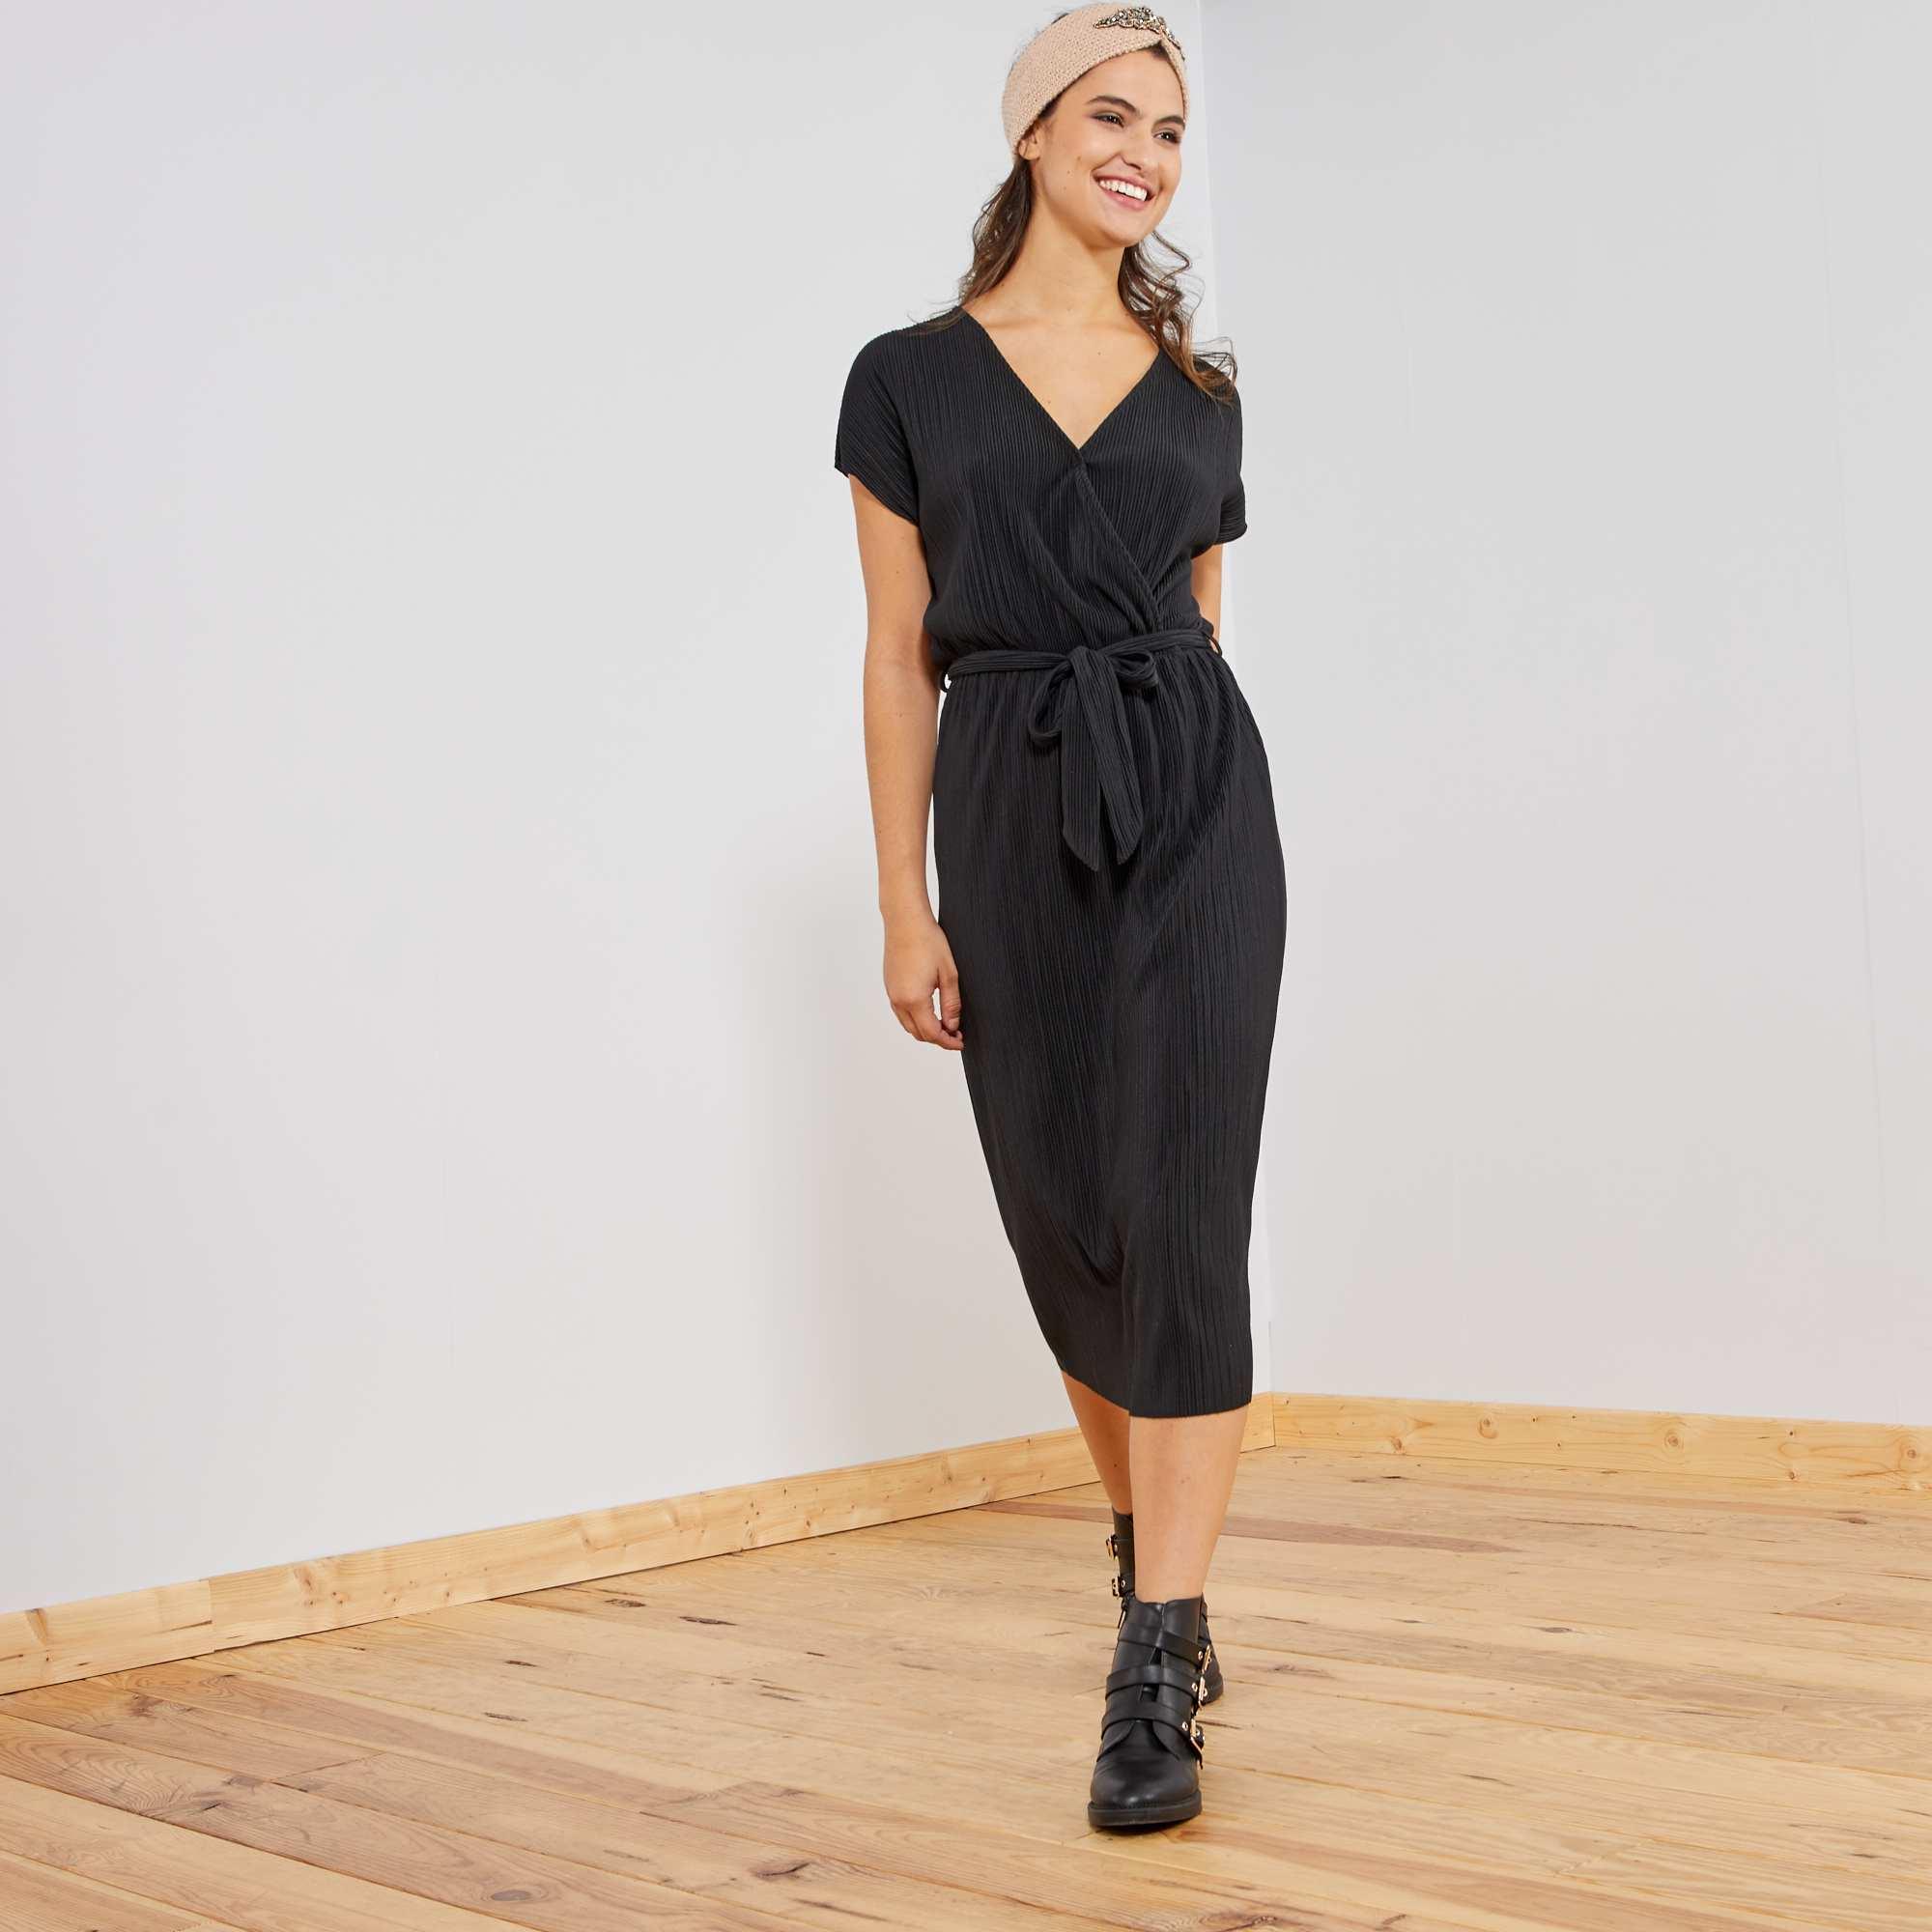 e54a0ead08 Vestido plisado con escote cruzado negro Mujer talla 34 a 48. Loading zoom